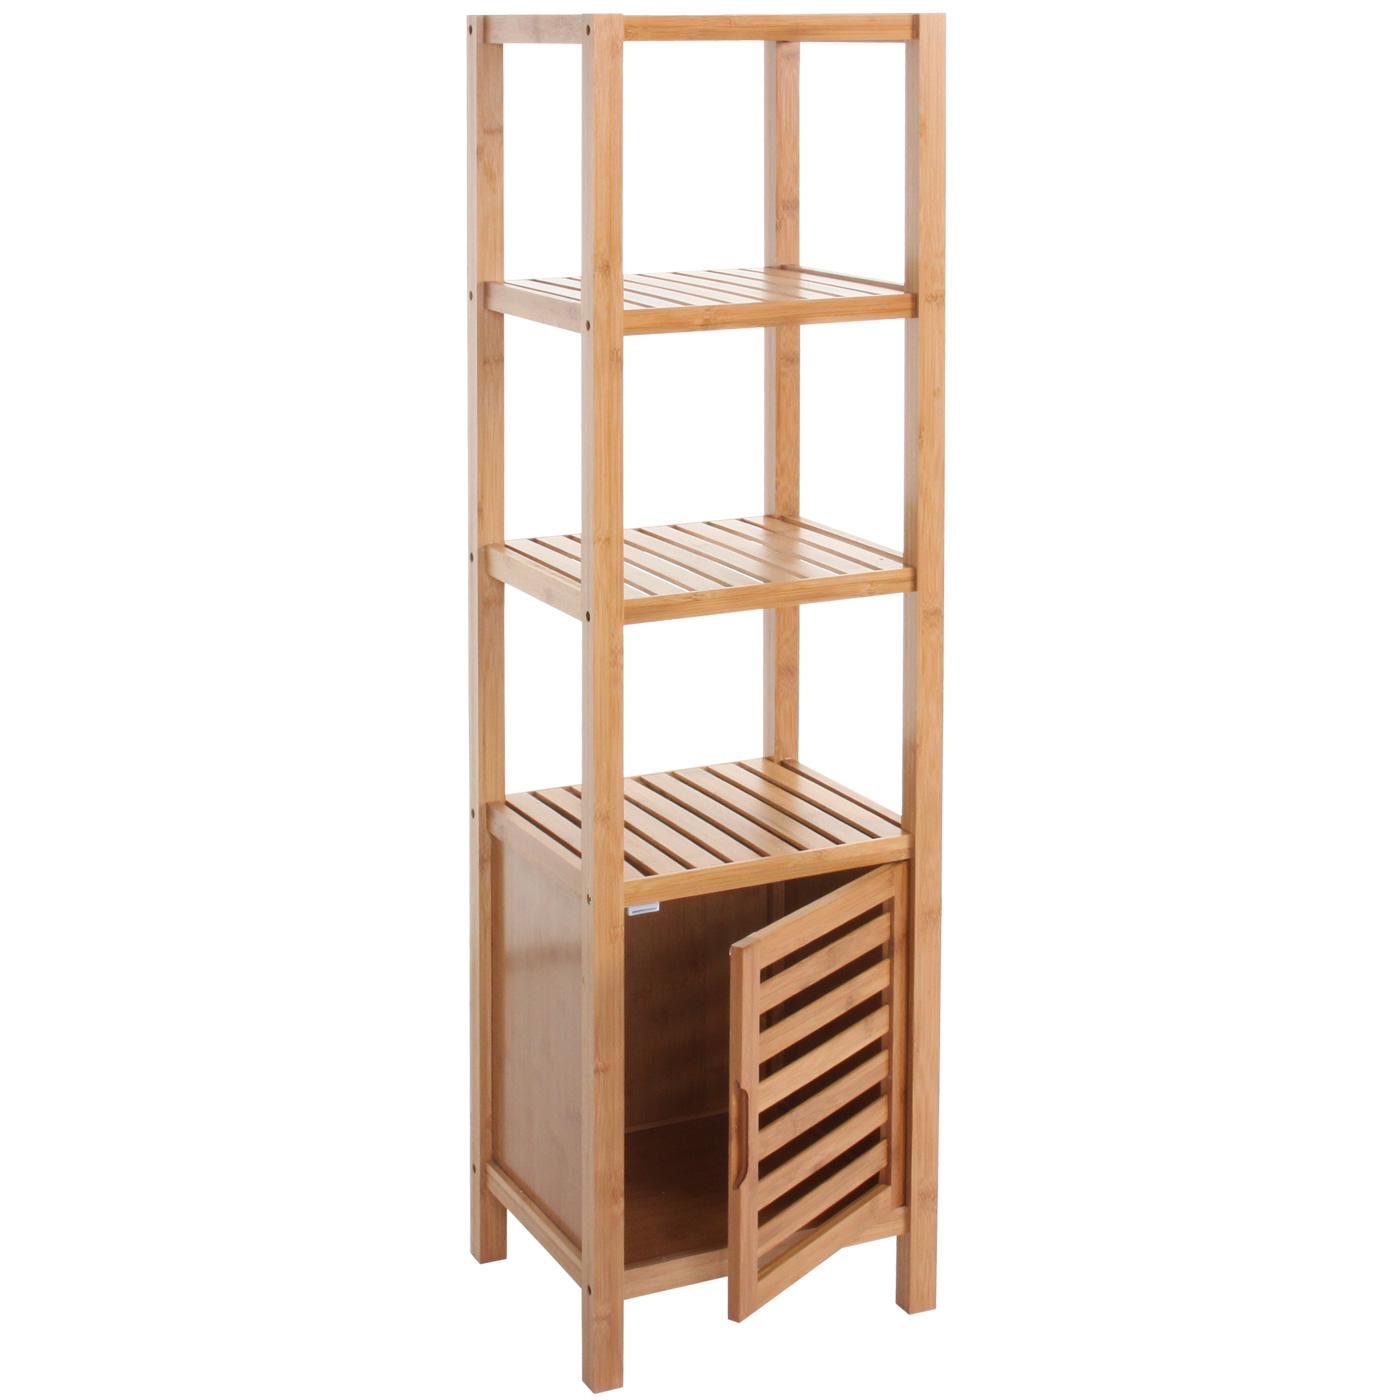 Badezimmer Set Nara, Badschrank Standregal Wäschekorb, Bambus 3-teilig | {Badschrank bambus 91}